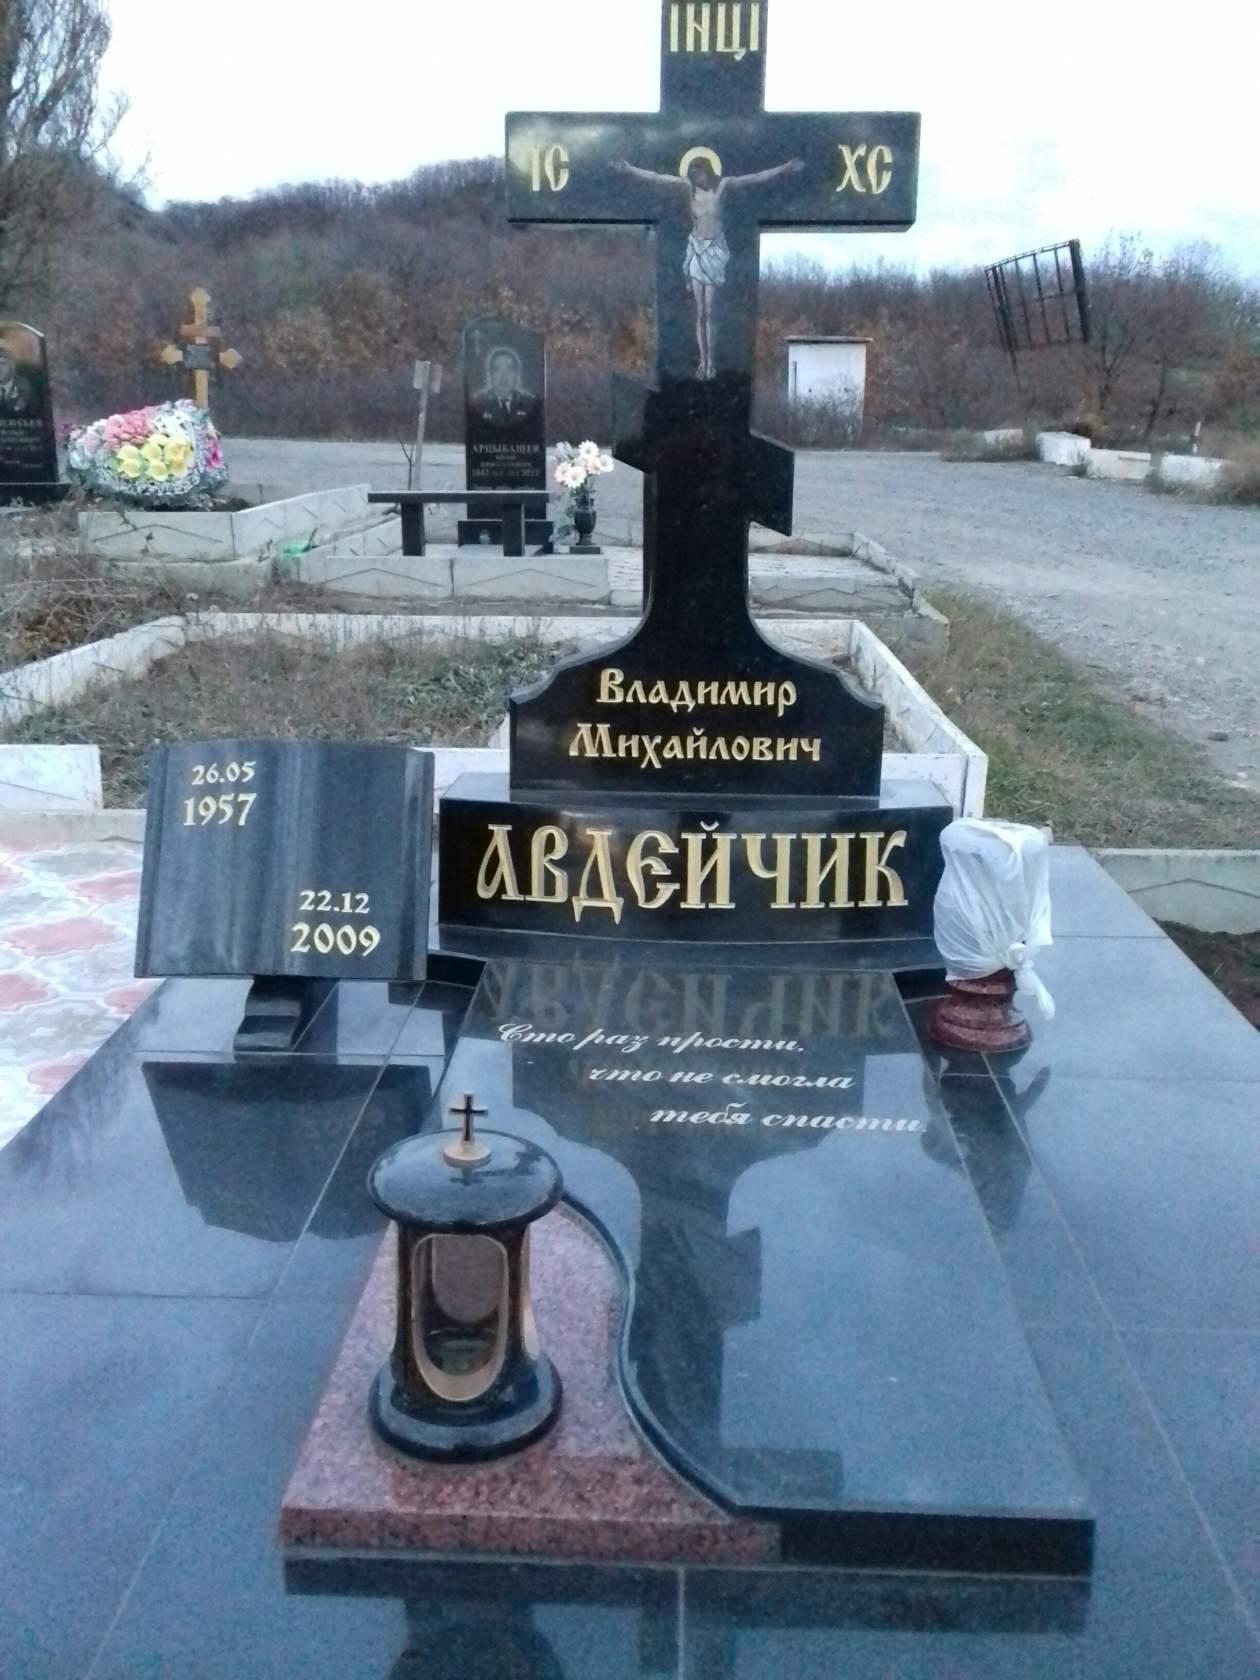 Бетон харцызск организация завода по производству бетона